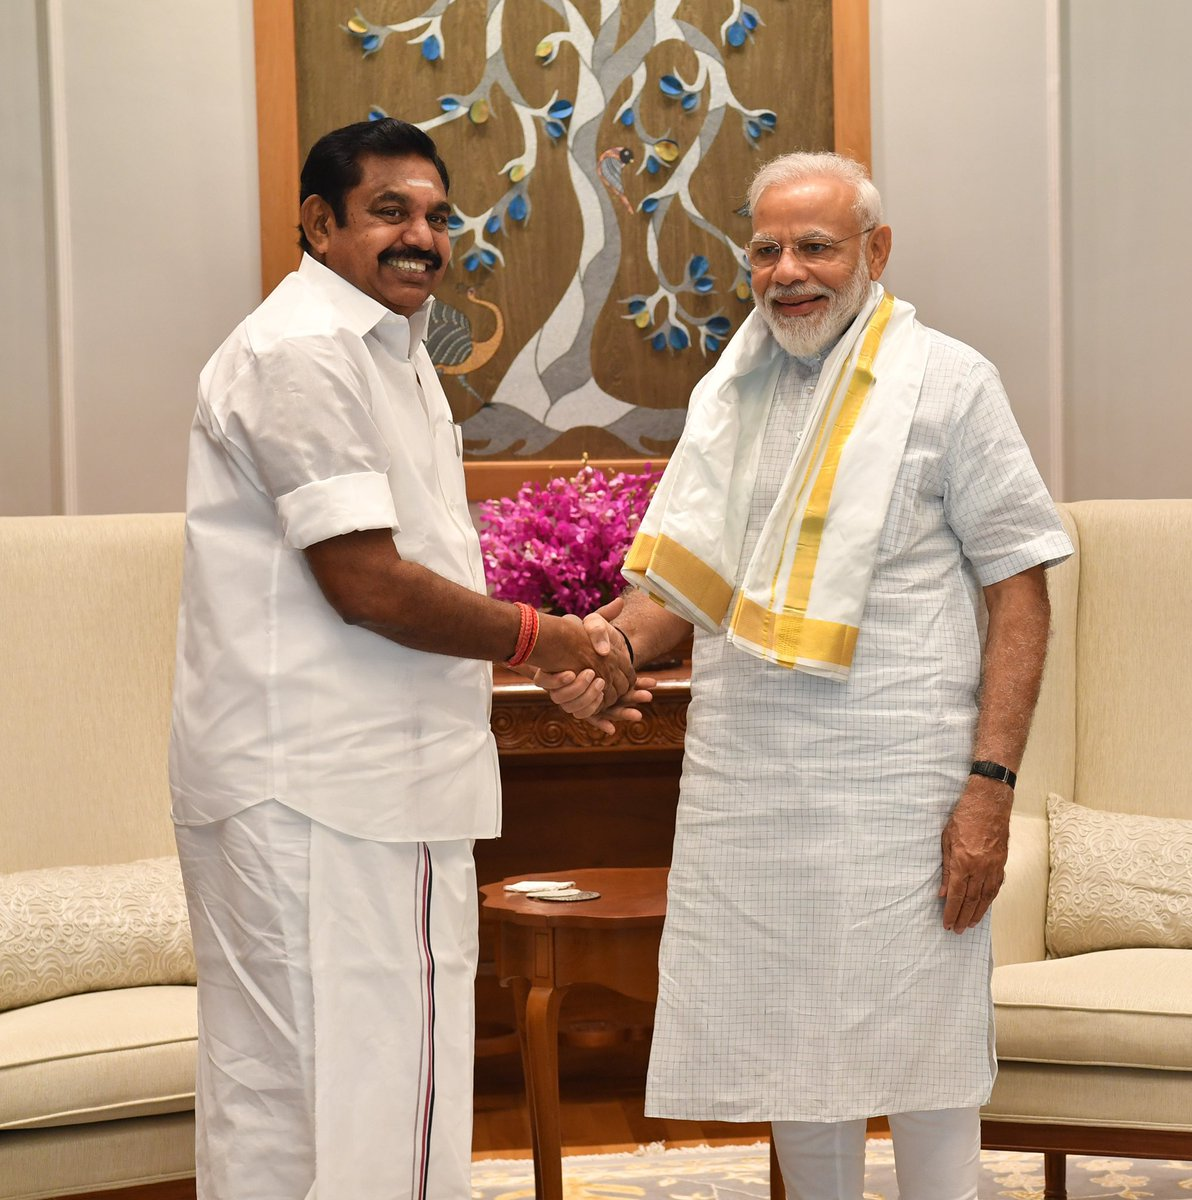 Shri Edappadi Palaniswami, Tamil Nadu Chief Minister met PM @narendramodi. @CMOTamilNadu https://t.co/RqGG3h81lH